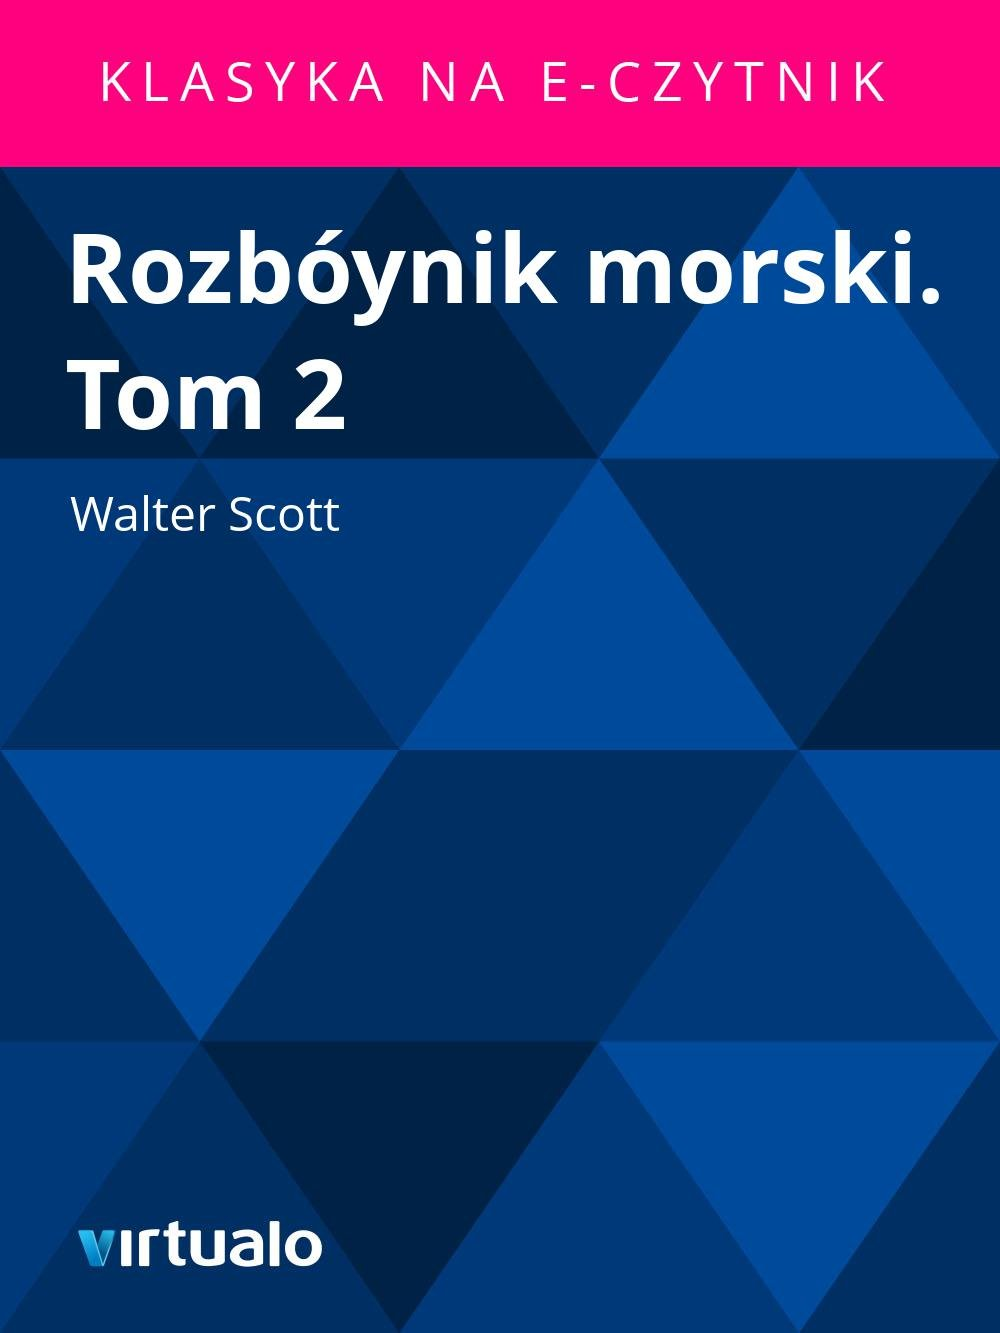 Rozbóynik morski. Tom 2 - Ebook (Książka EPUB) do pobrania w formacie EPUB